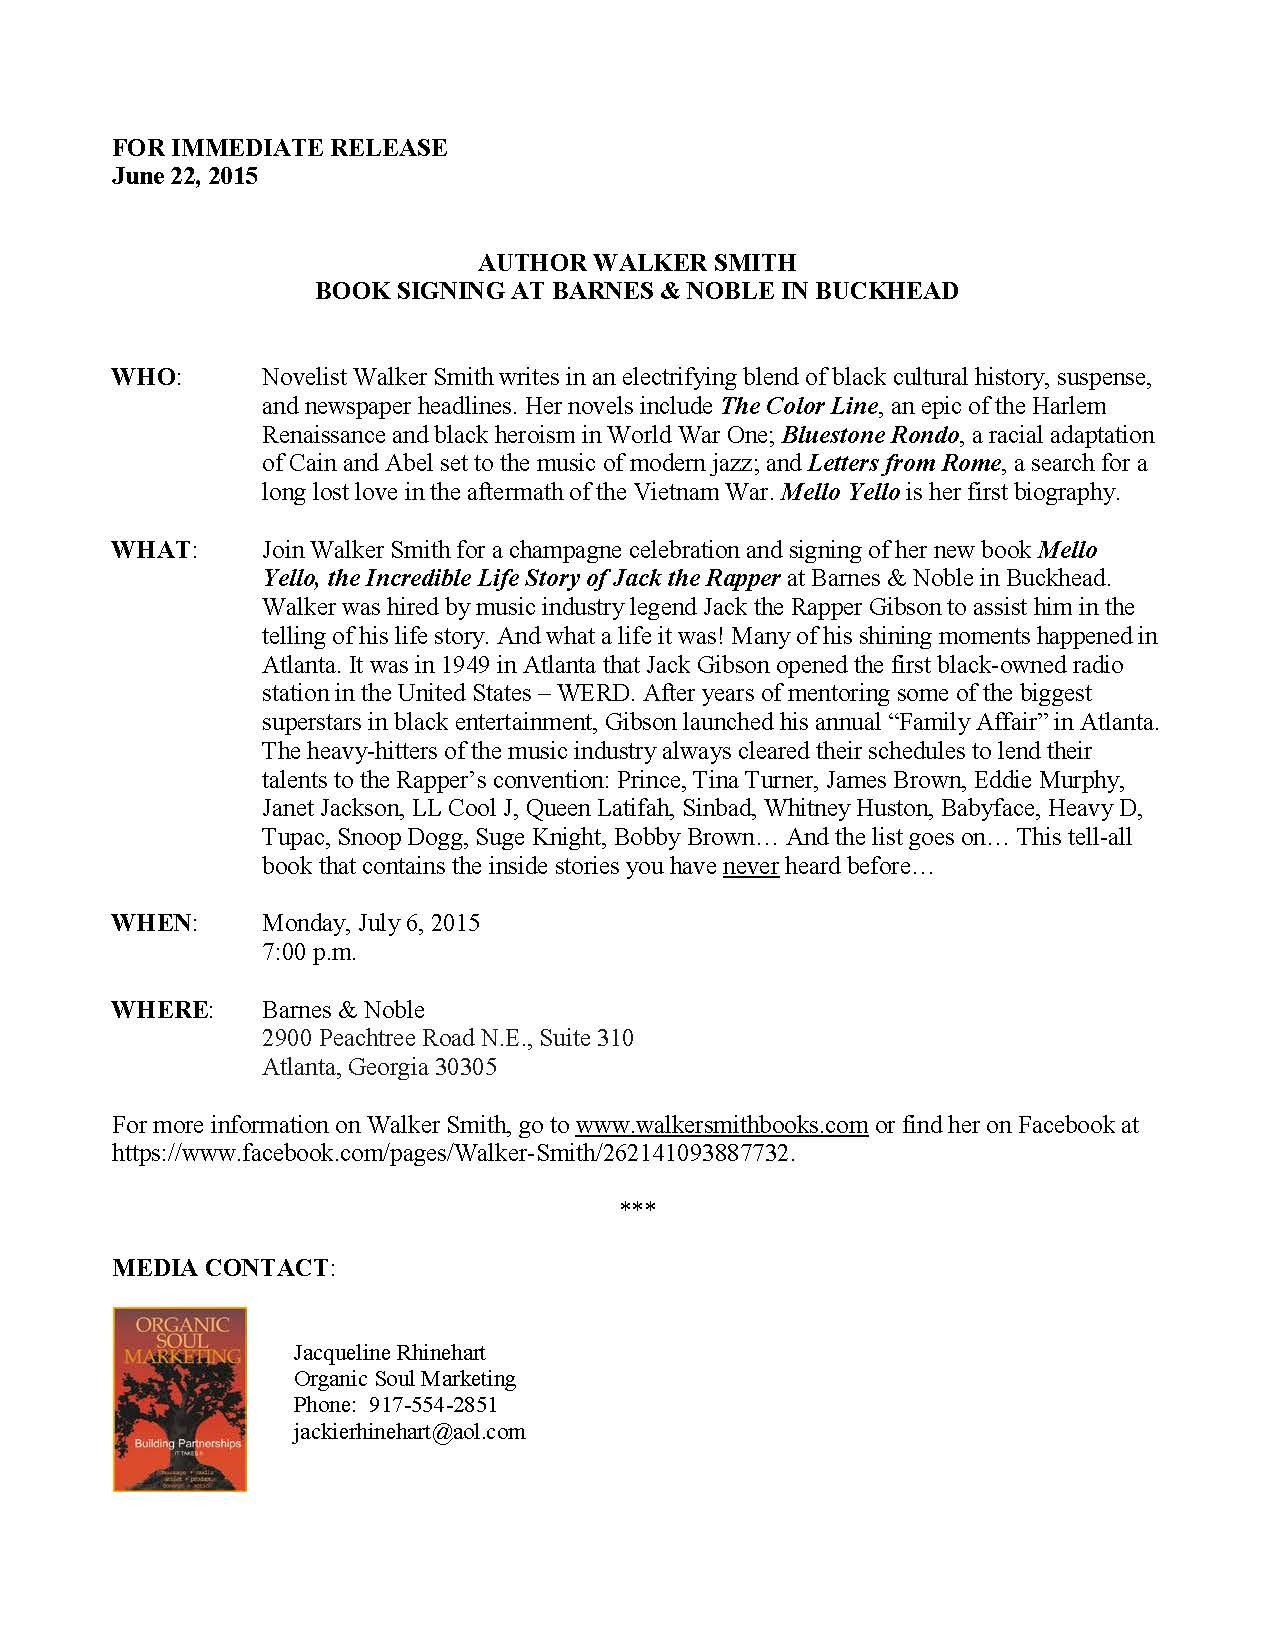 B&N Buckhead Press Release